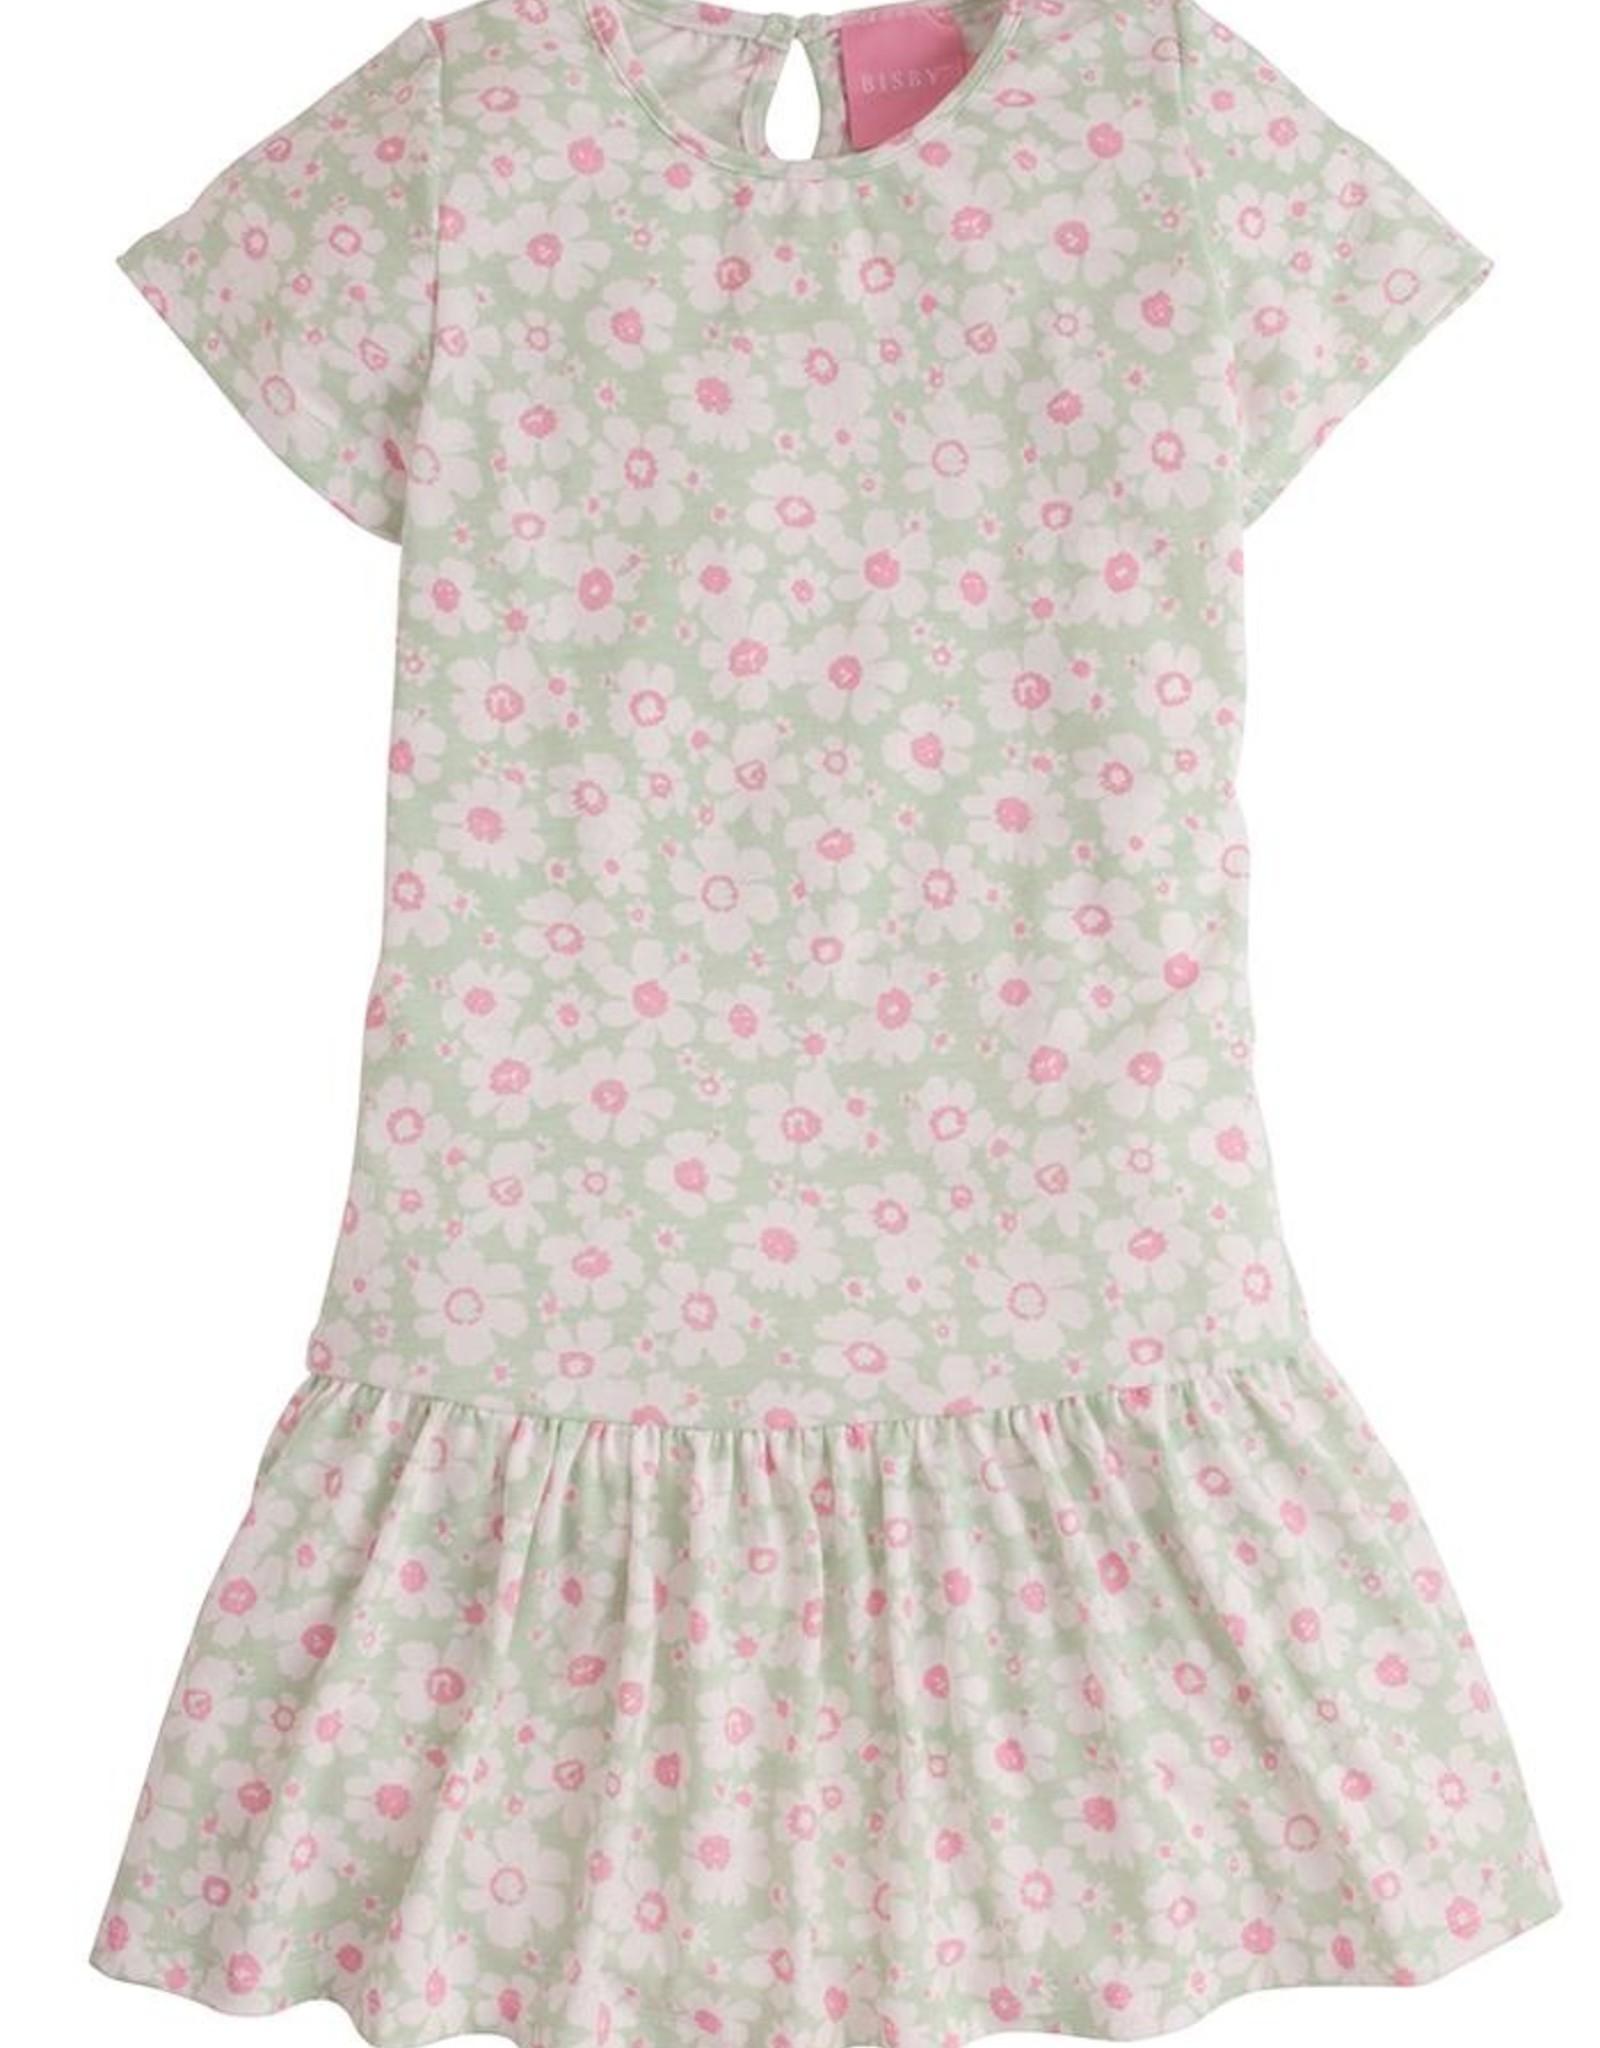 Bisby Isabel Dress - Mint Daisy Jersey